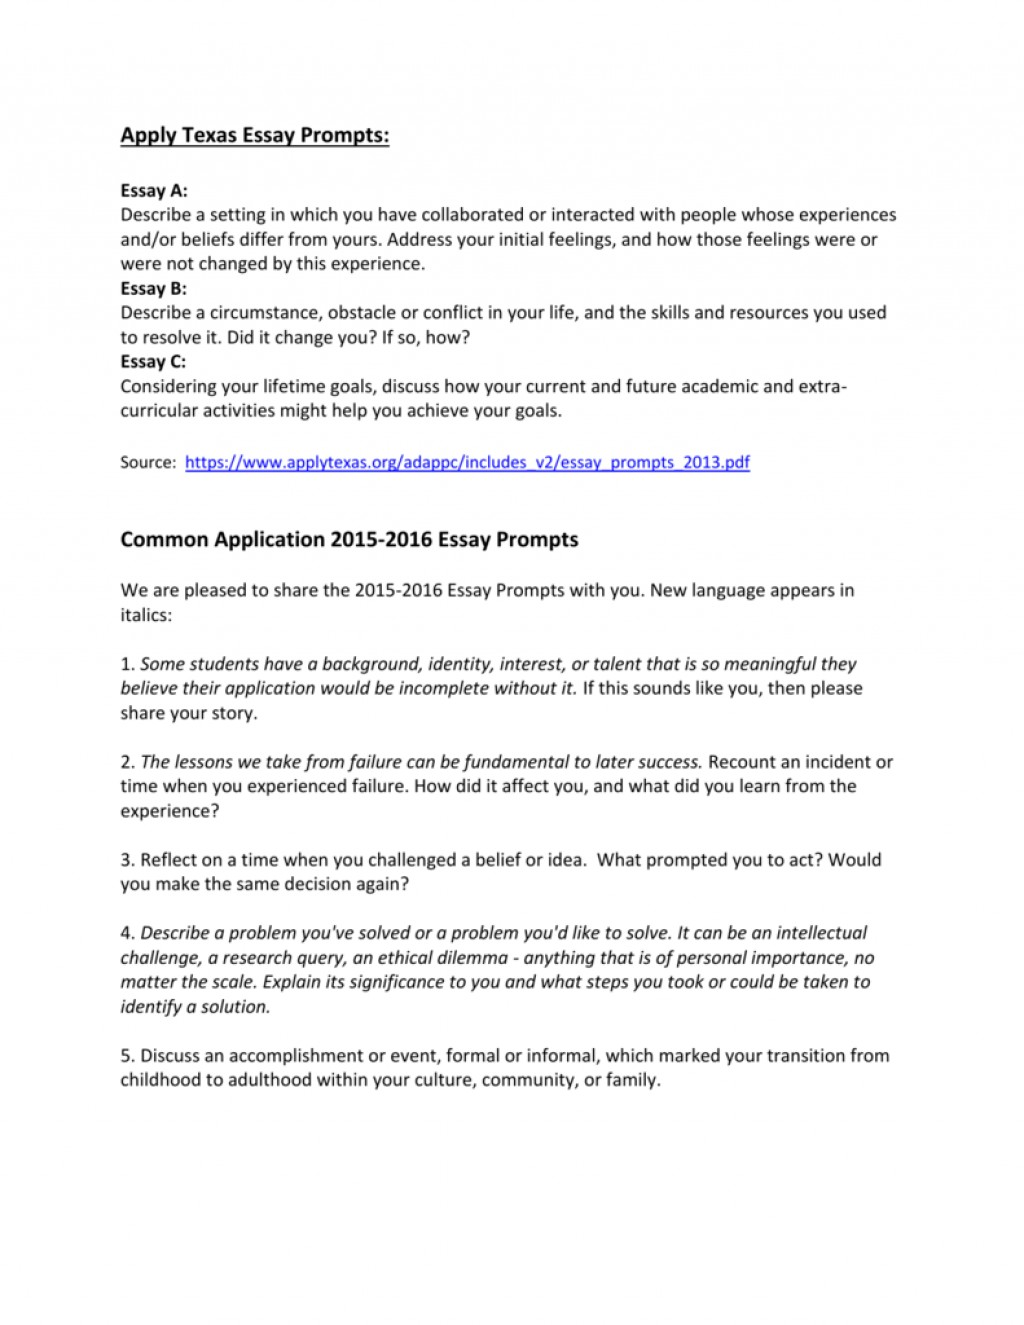 001 Apply Texas Essays Fall 008198809 1 Essay Impressive 2015 Large